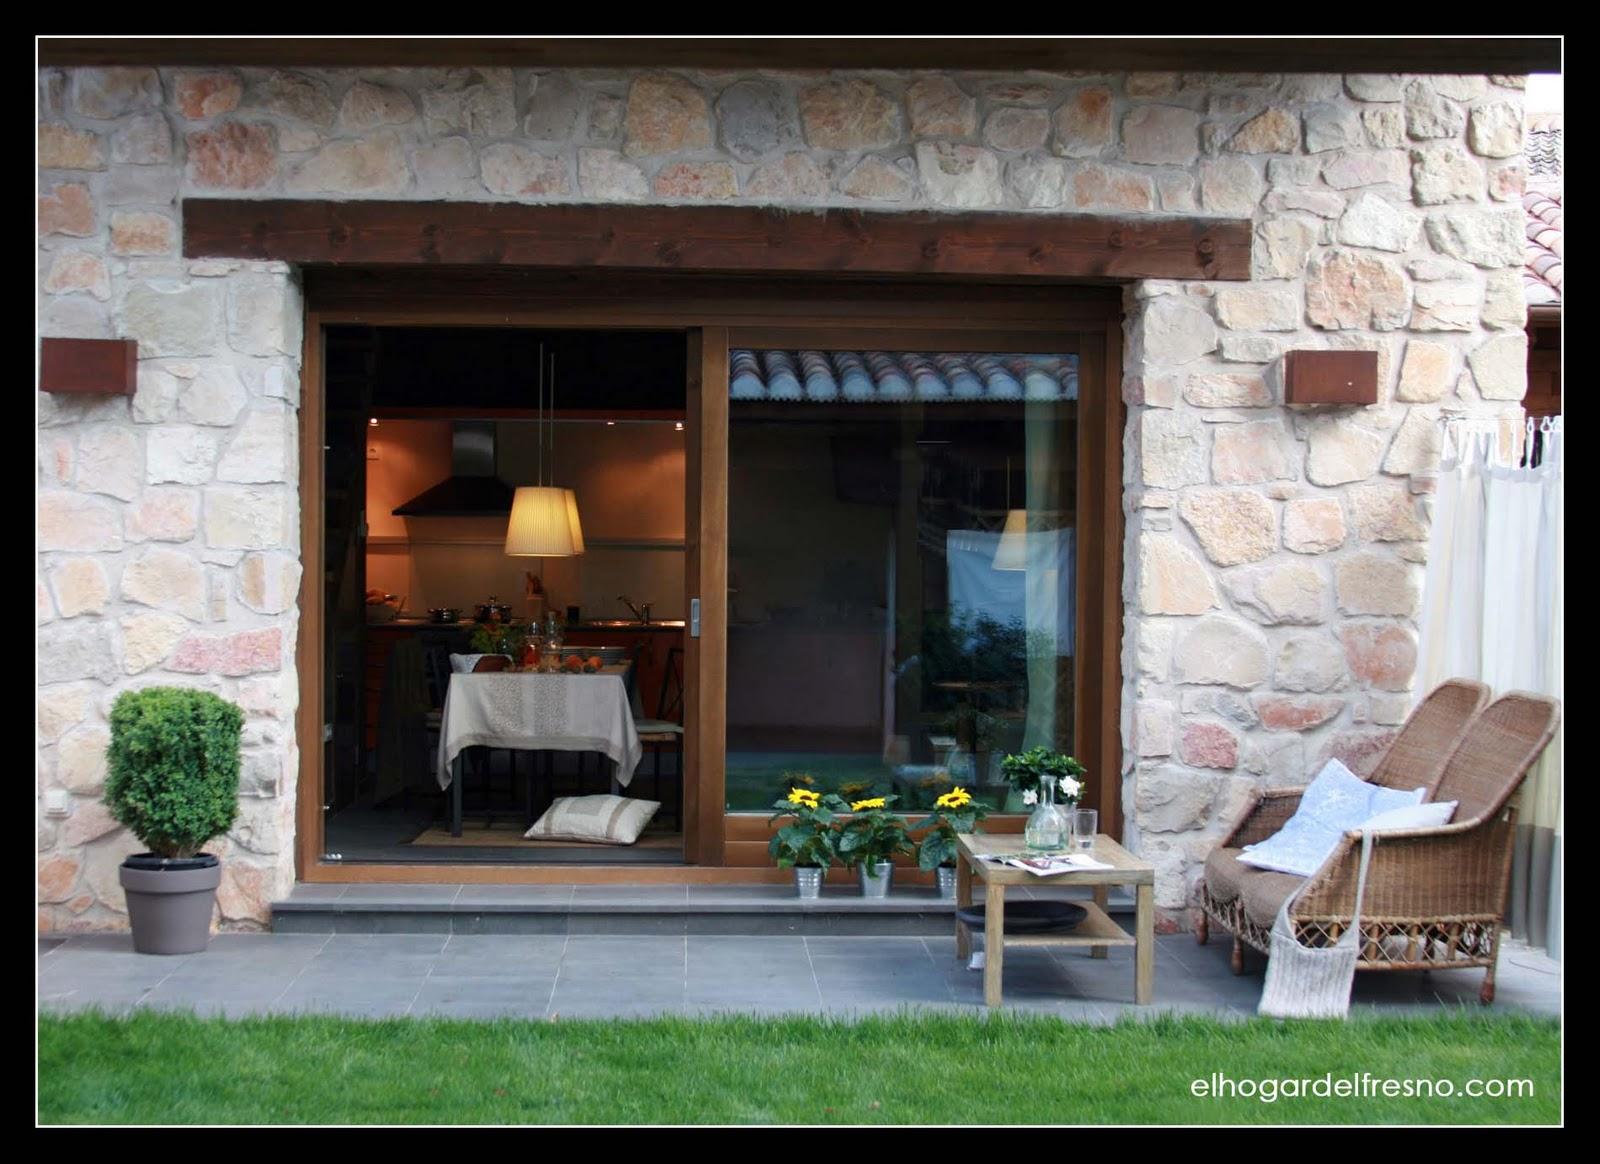 Casa con encanto en segovia a 100 km de madrid casa - Casas de madera con encanto ...